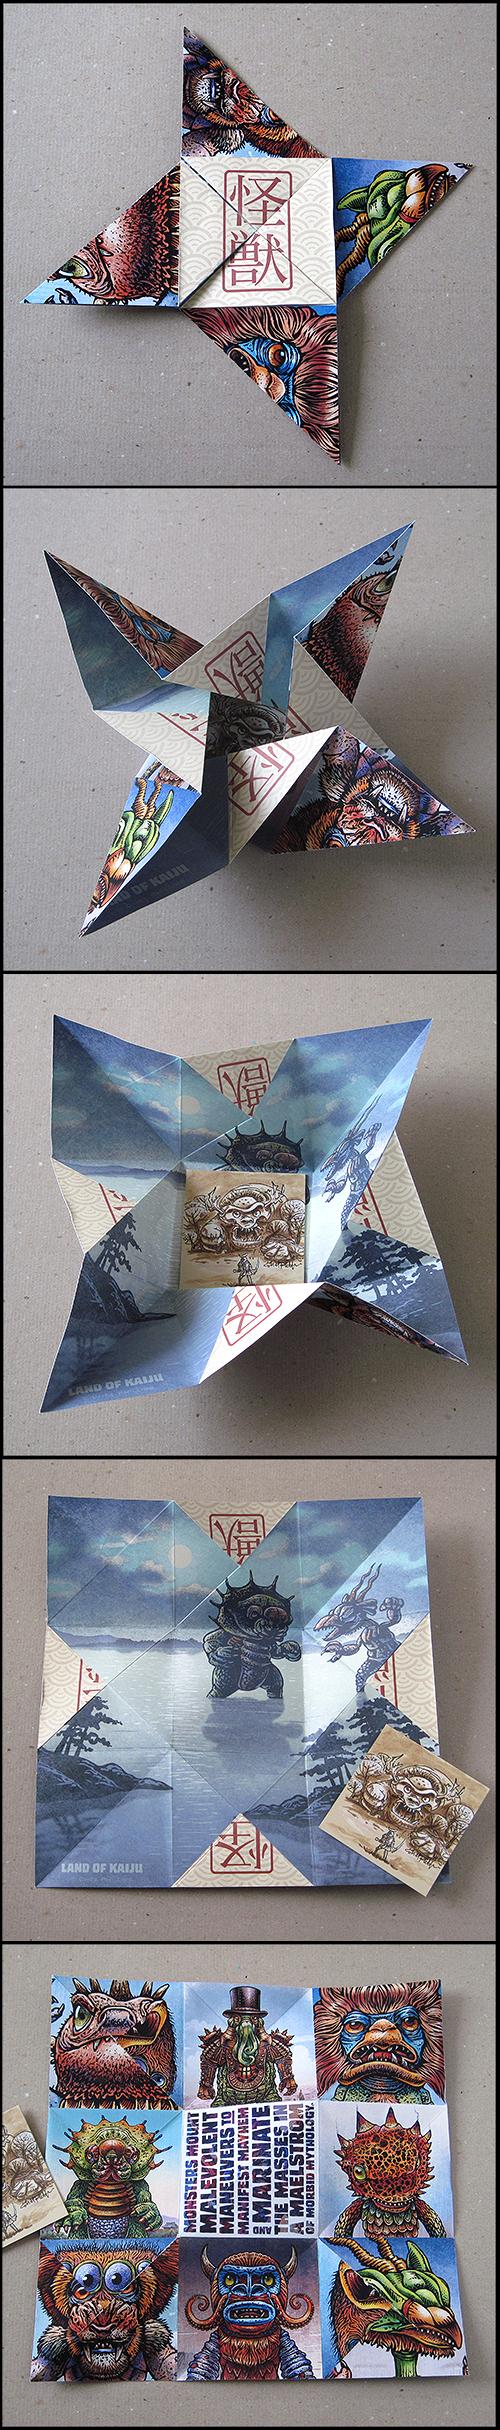 Puzzlefoursome-vertical-Blog